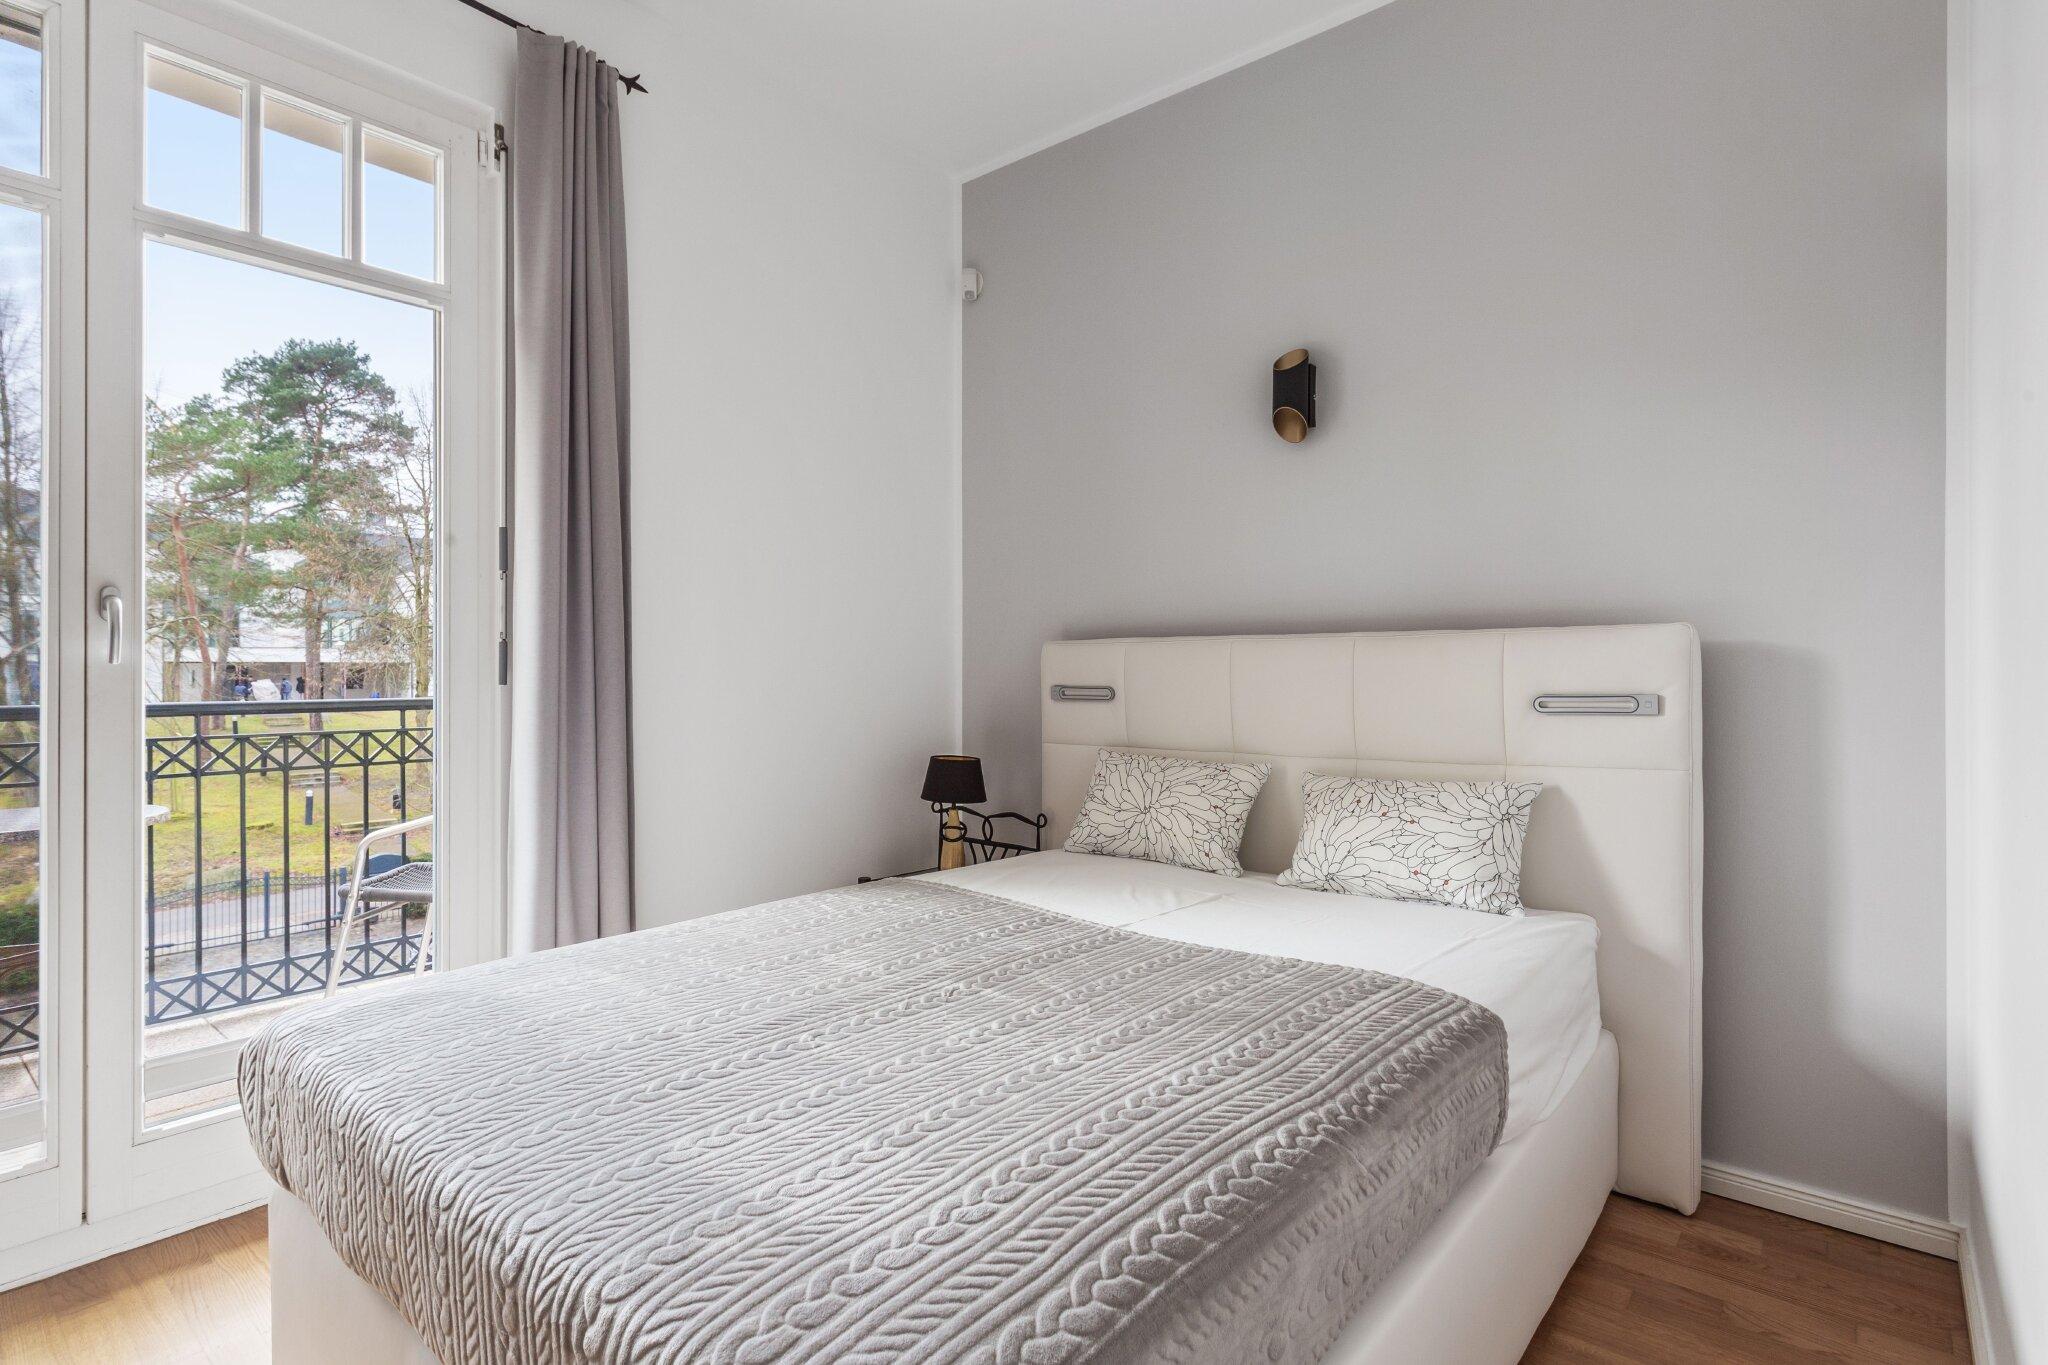 Ruheraum mit Zugang zum Schwimmbad